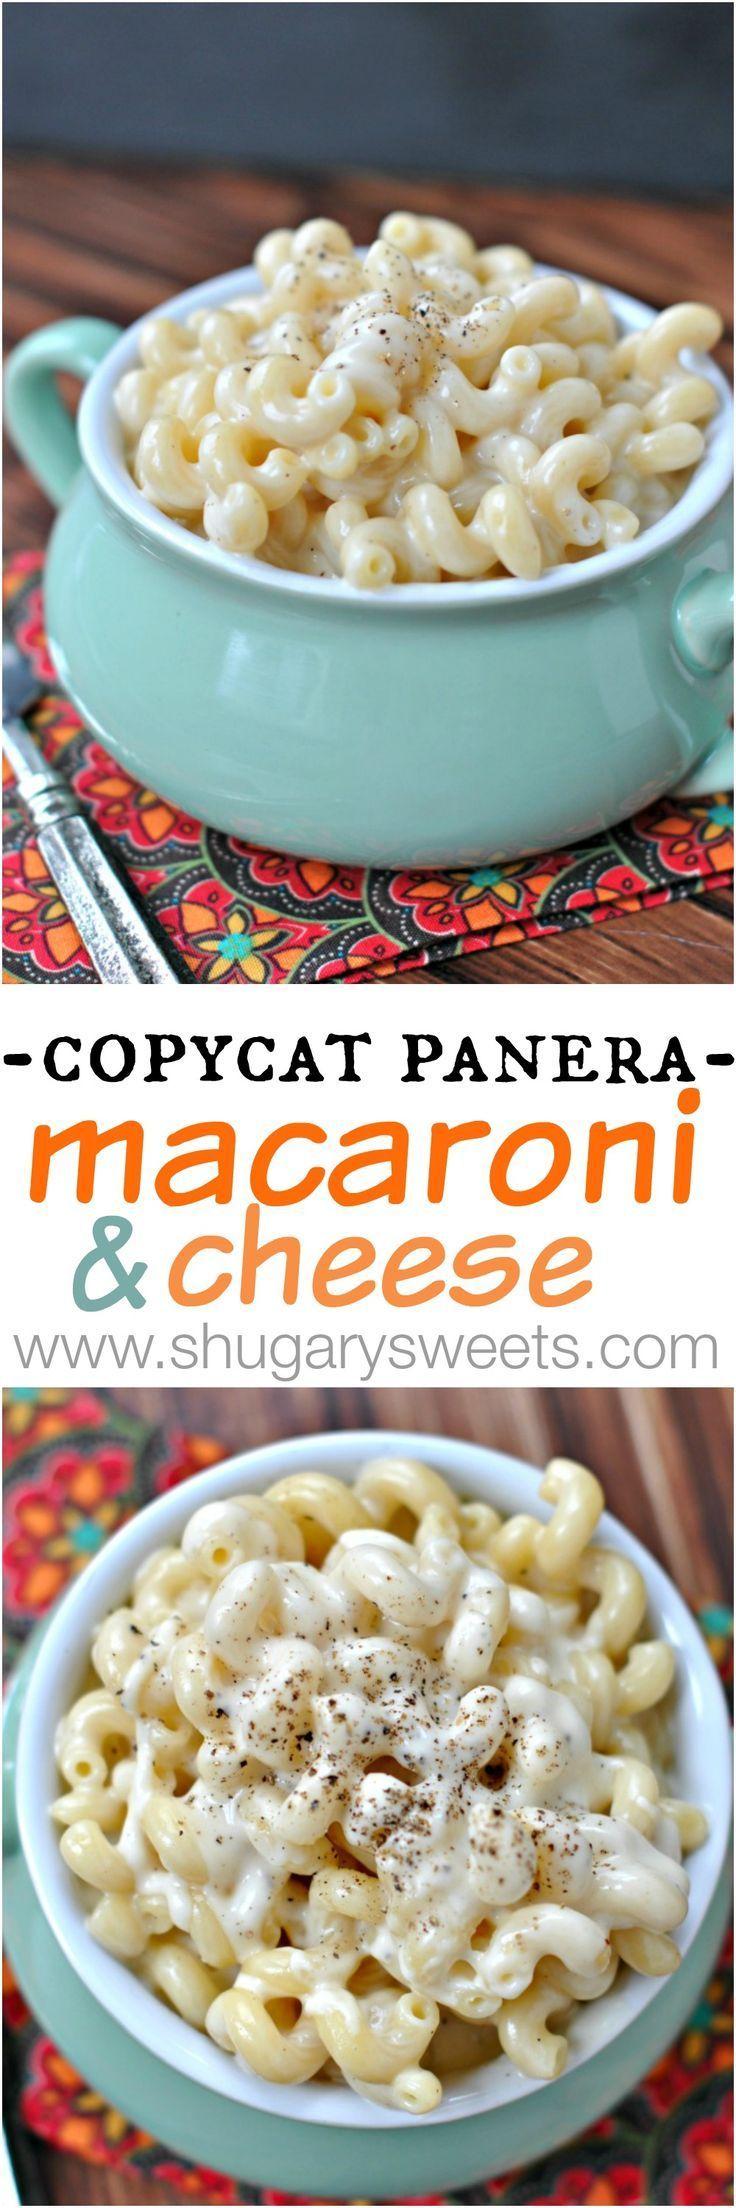 Copycat Panera Macaroni and Cheese